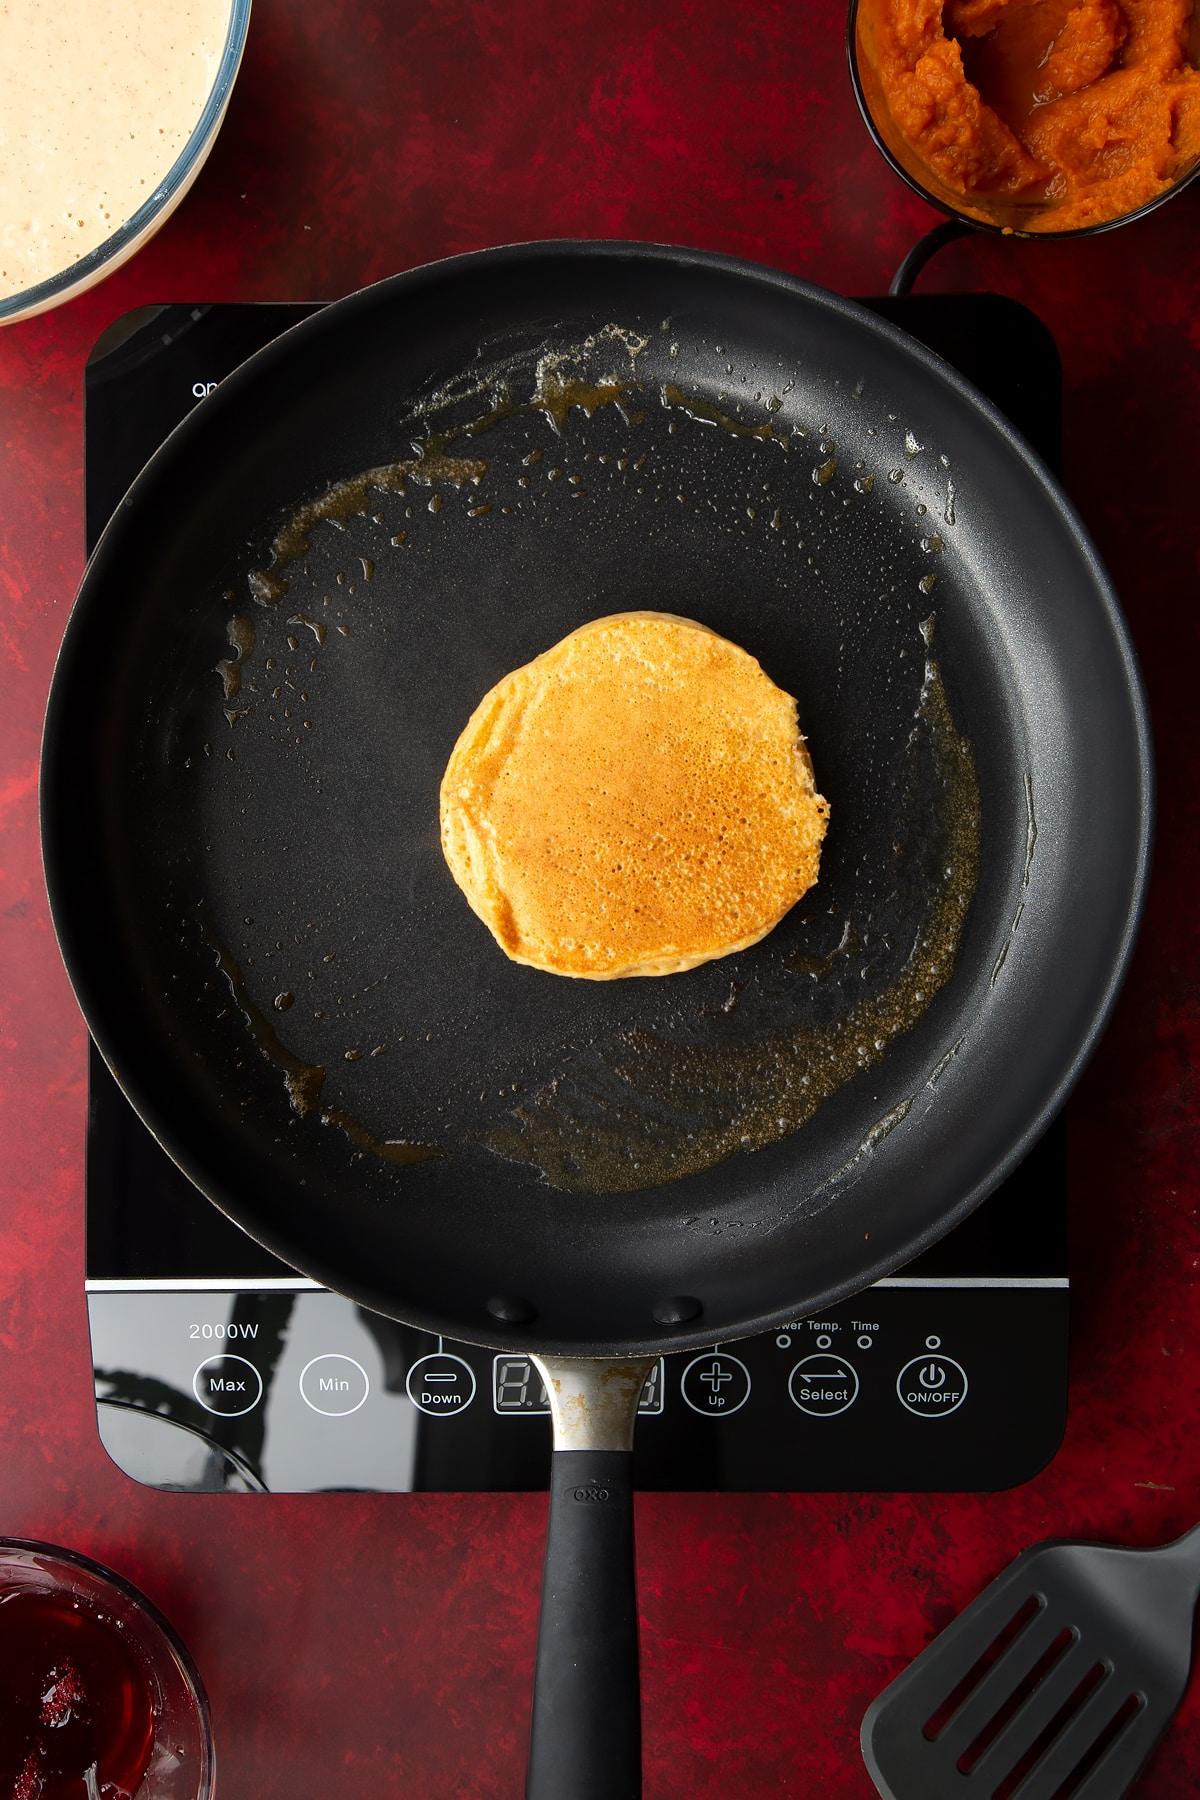 A cooked pumpkin pancake in a greased frying pan. Ingredients to make Halloween pancakes surround the pan.